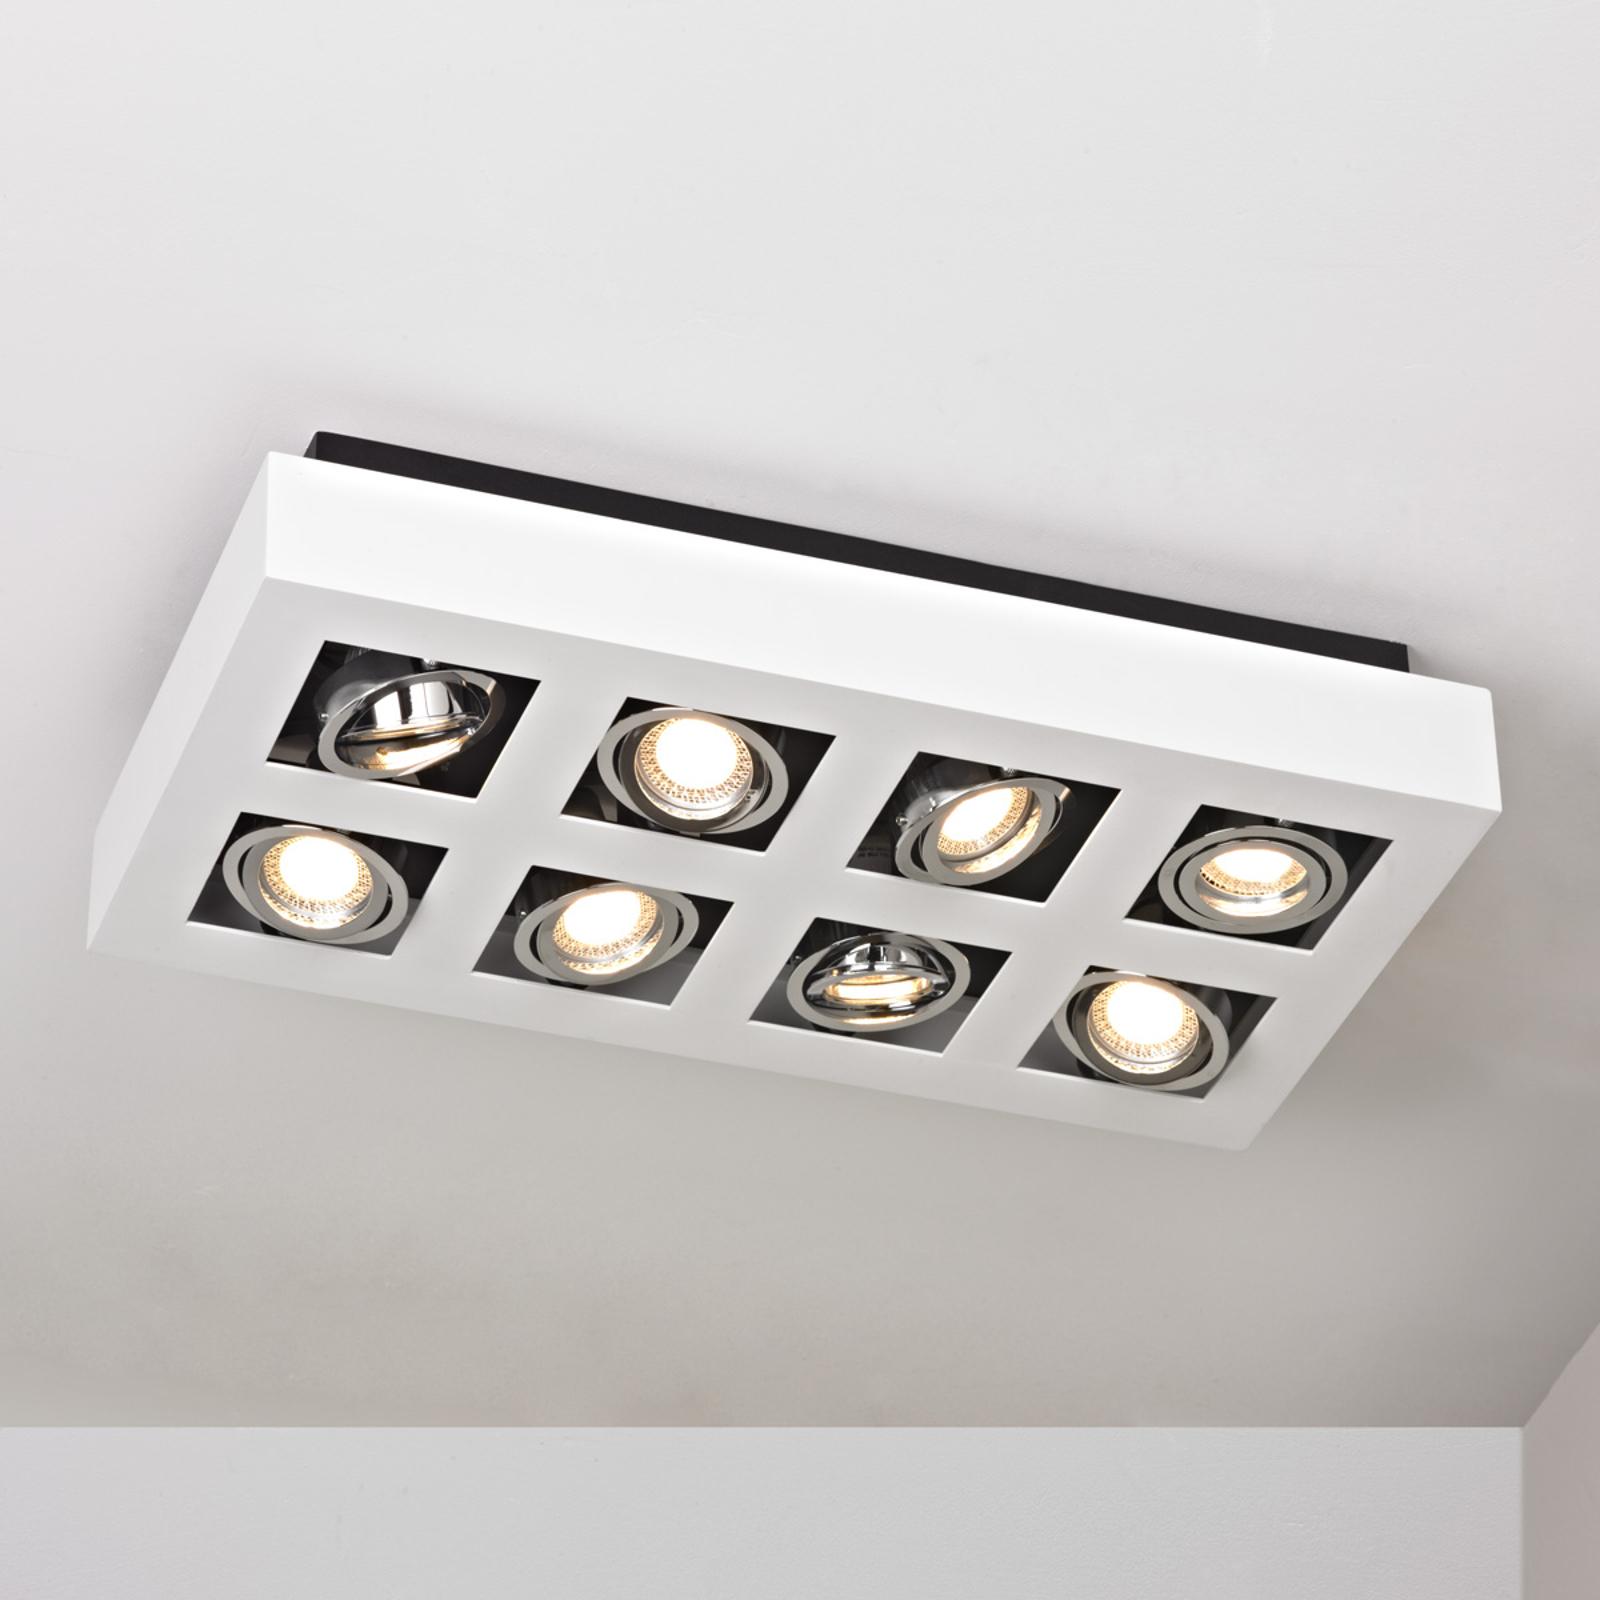 Mocna lampa sufitowa LED VINCE, biała, 8-pkt.